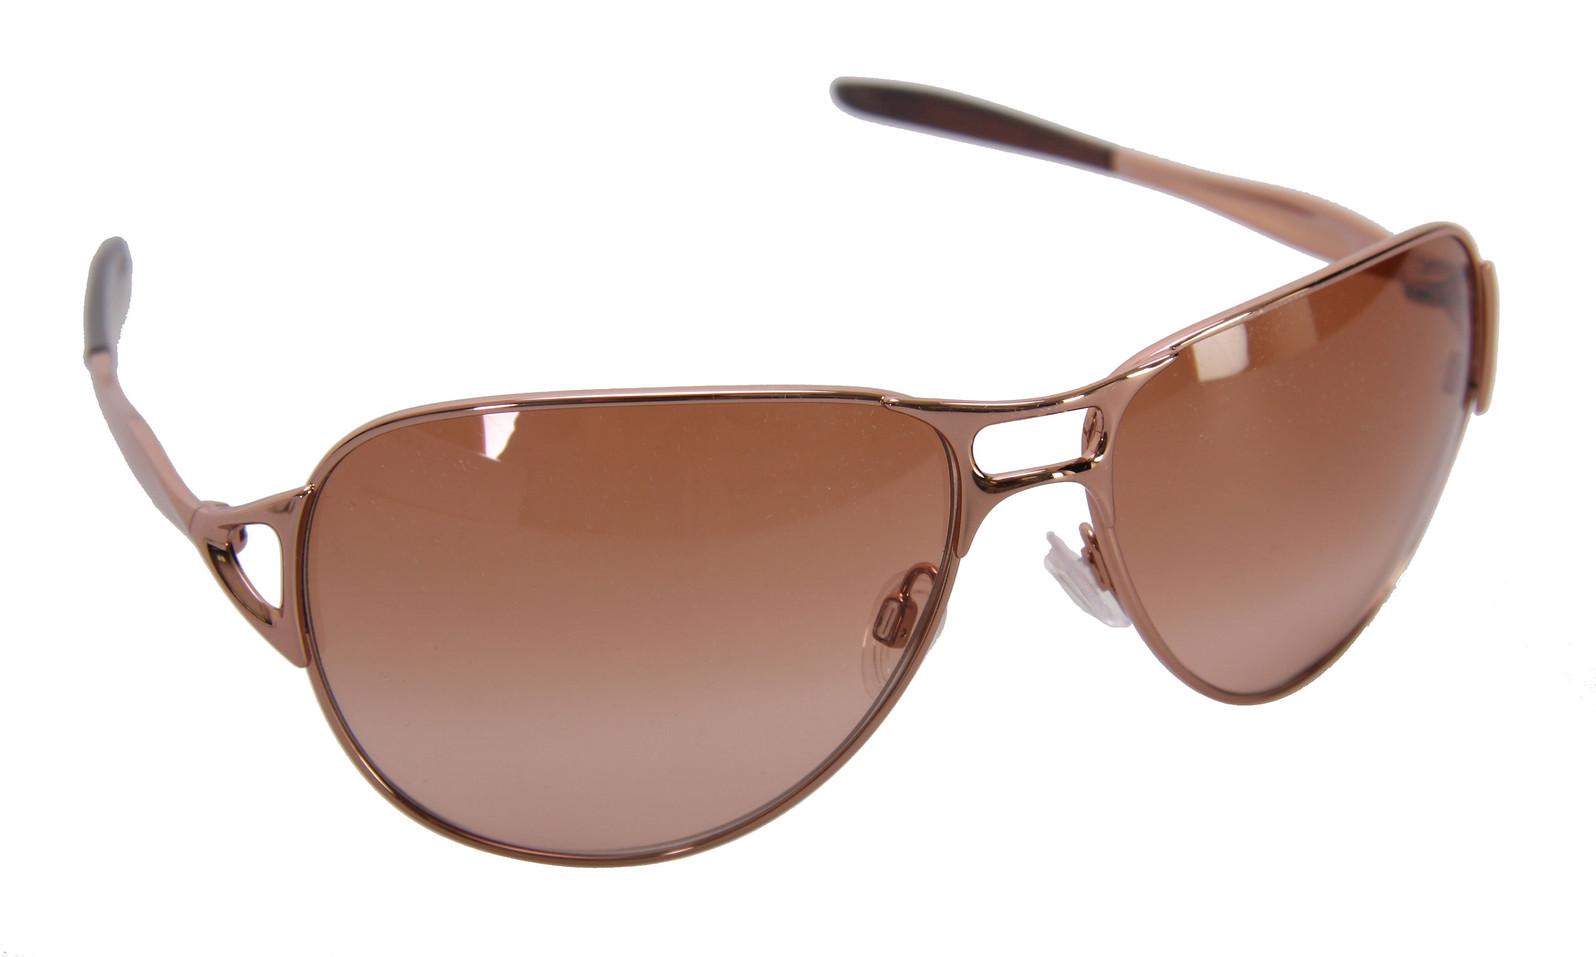 Oakley Hinder Sunglasses Rose Gold/Vr50 Brown Grad Lens  oakley-hinder-sngls-wmns-rosegoldbrwngrad-10.jpg